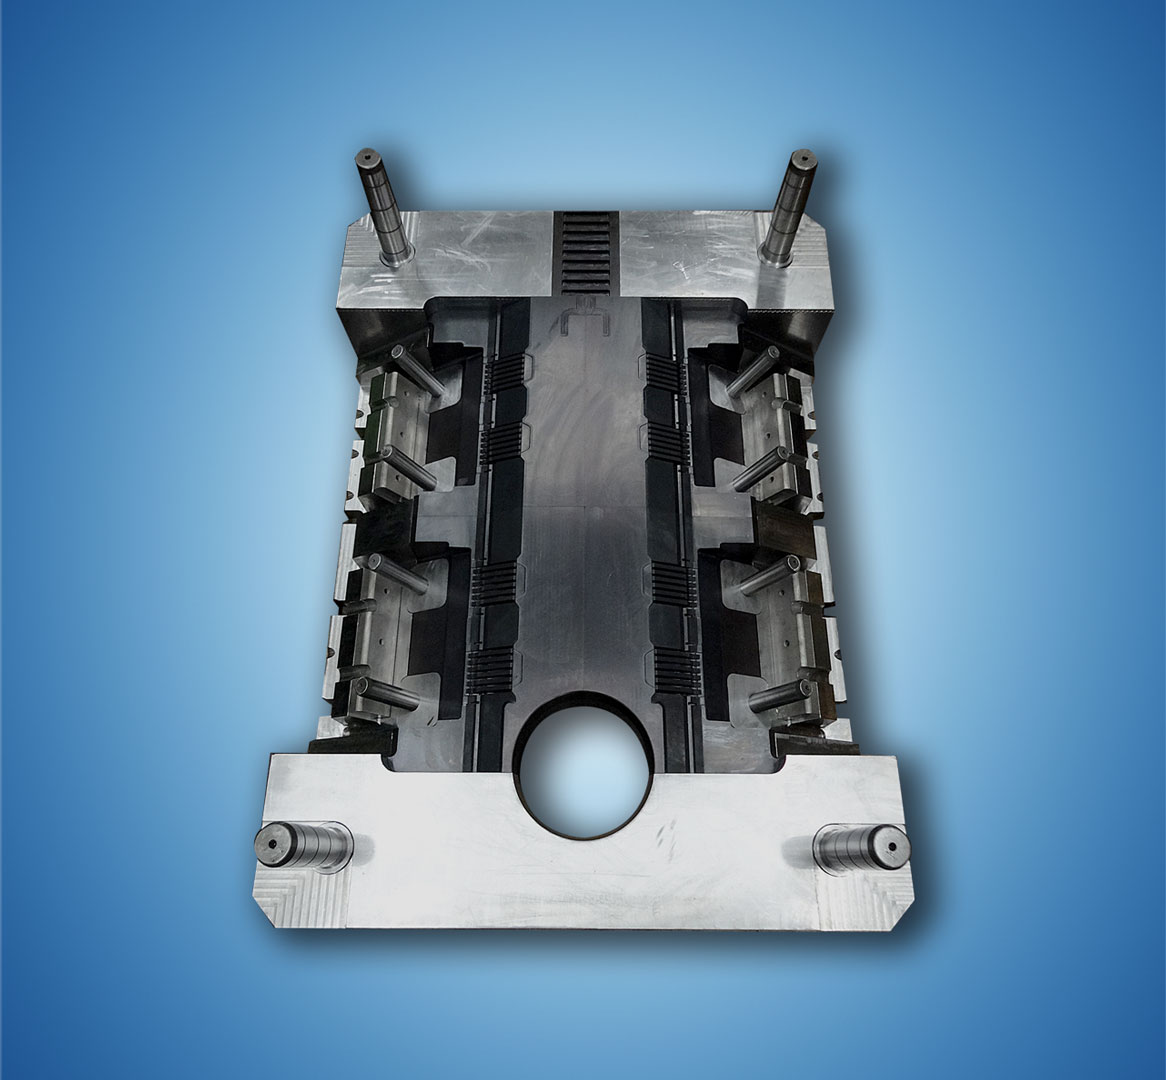 Ero-Projekt-d.o.o.-Toolshop-Werkzeugbau-1-Orodja-za-tlacno-litje-_-slika-3